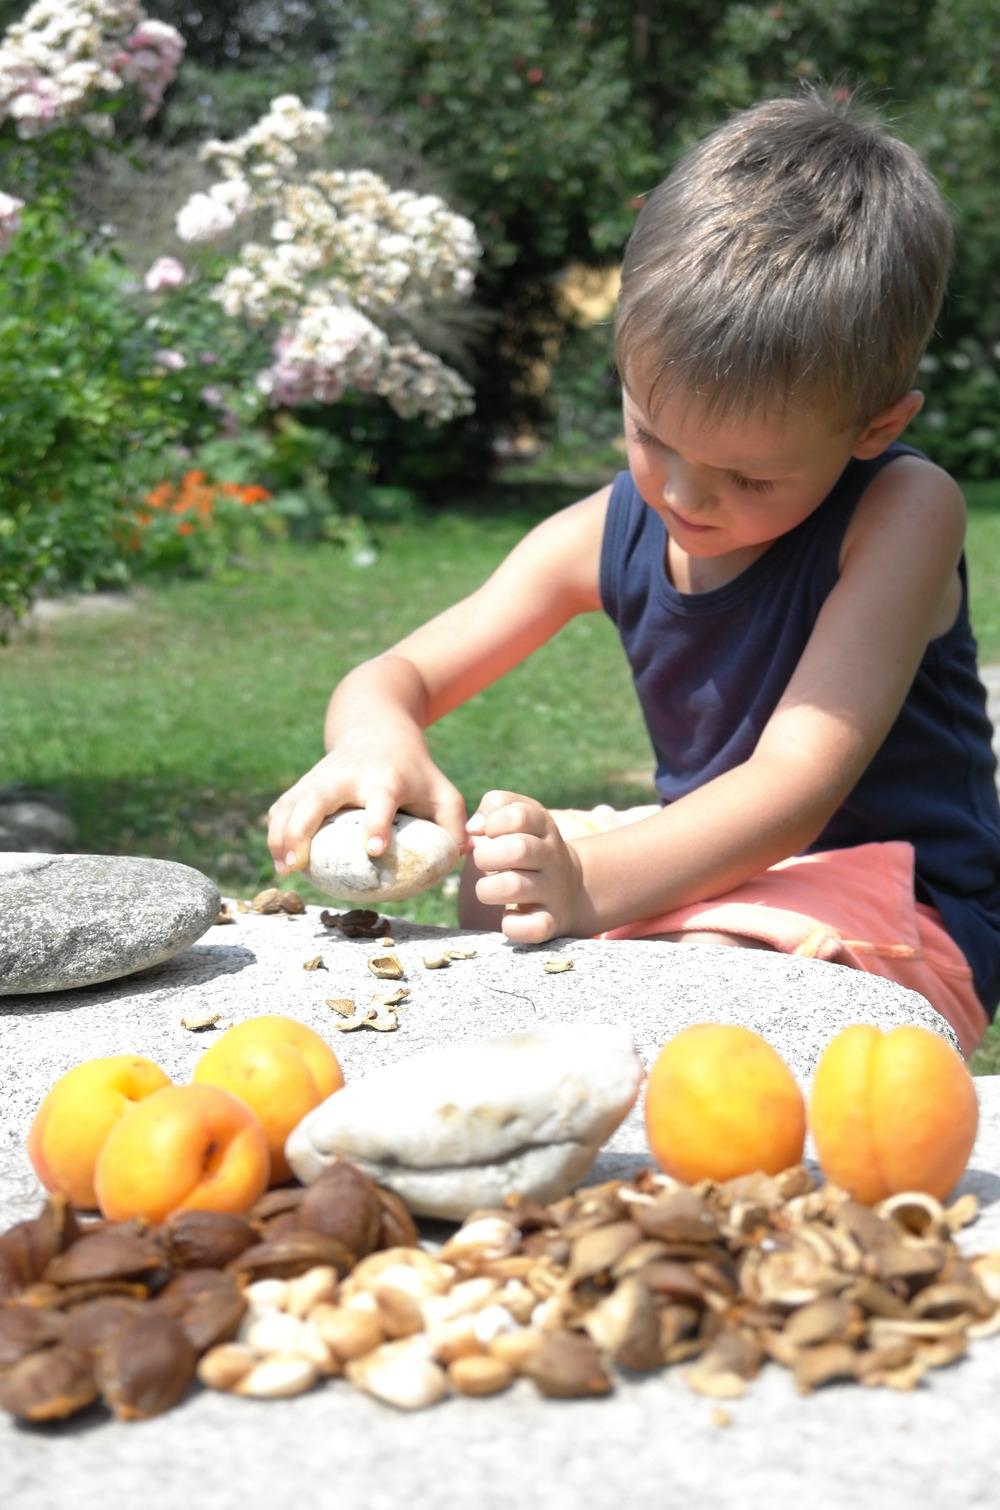 Mein großer Sohn Benedikt ist ein begeisterter Kerneknacker :)